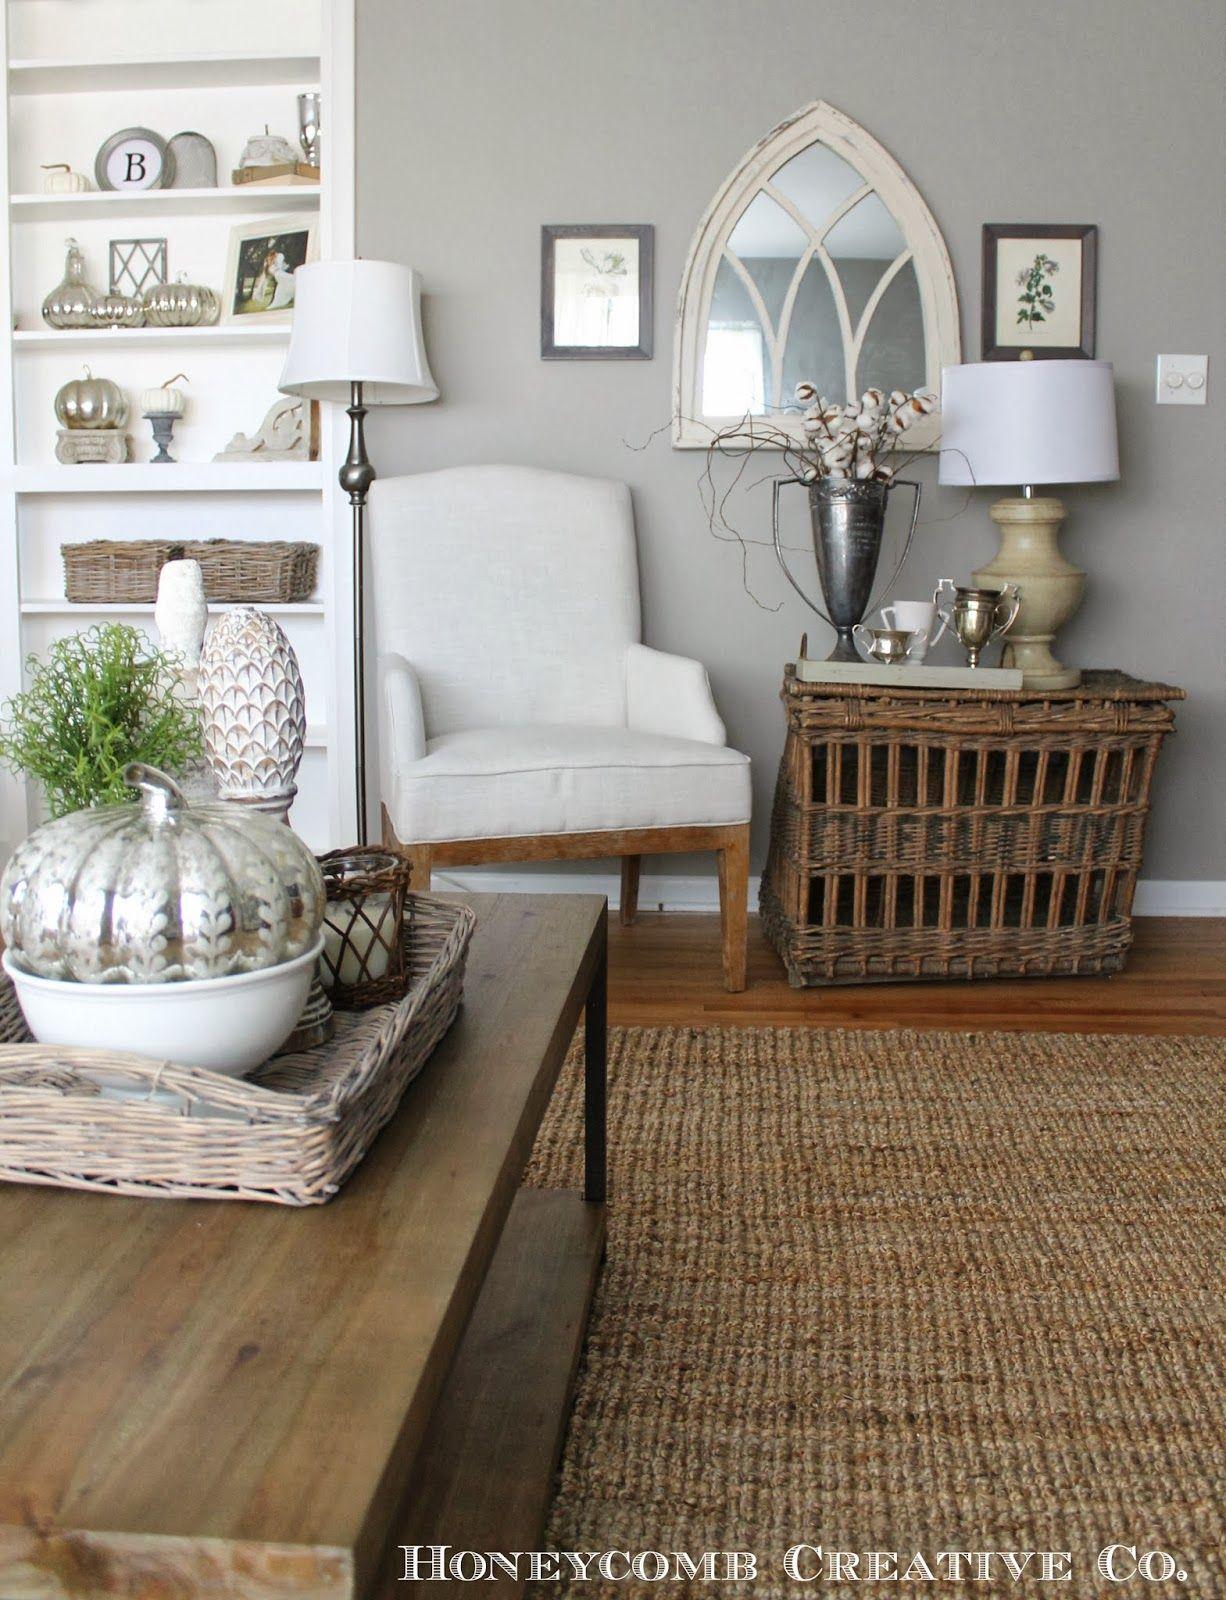 silver grey sofa what colour walls sleeper dimensions honeycomb creative co house tour wood floor sisal rug